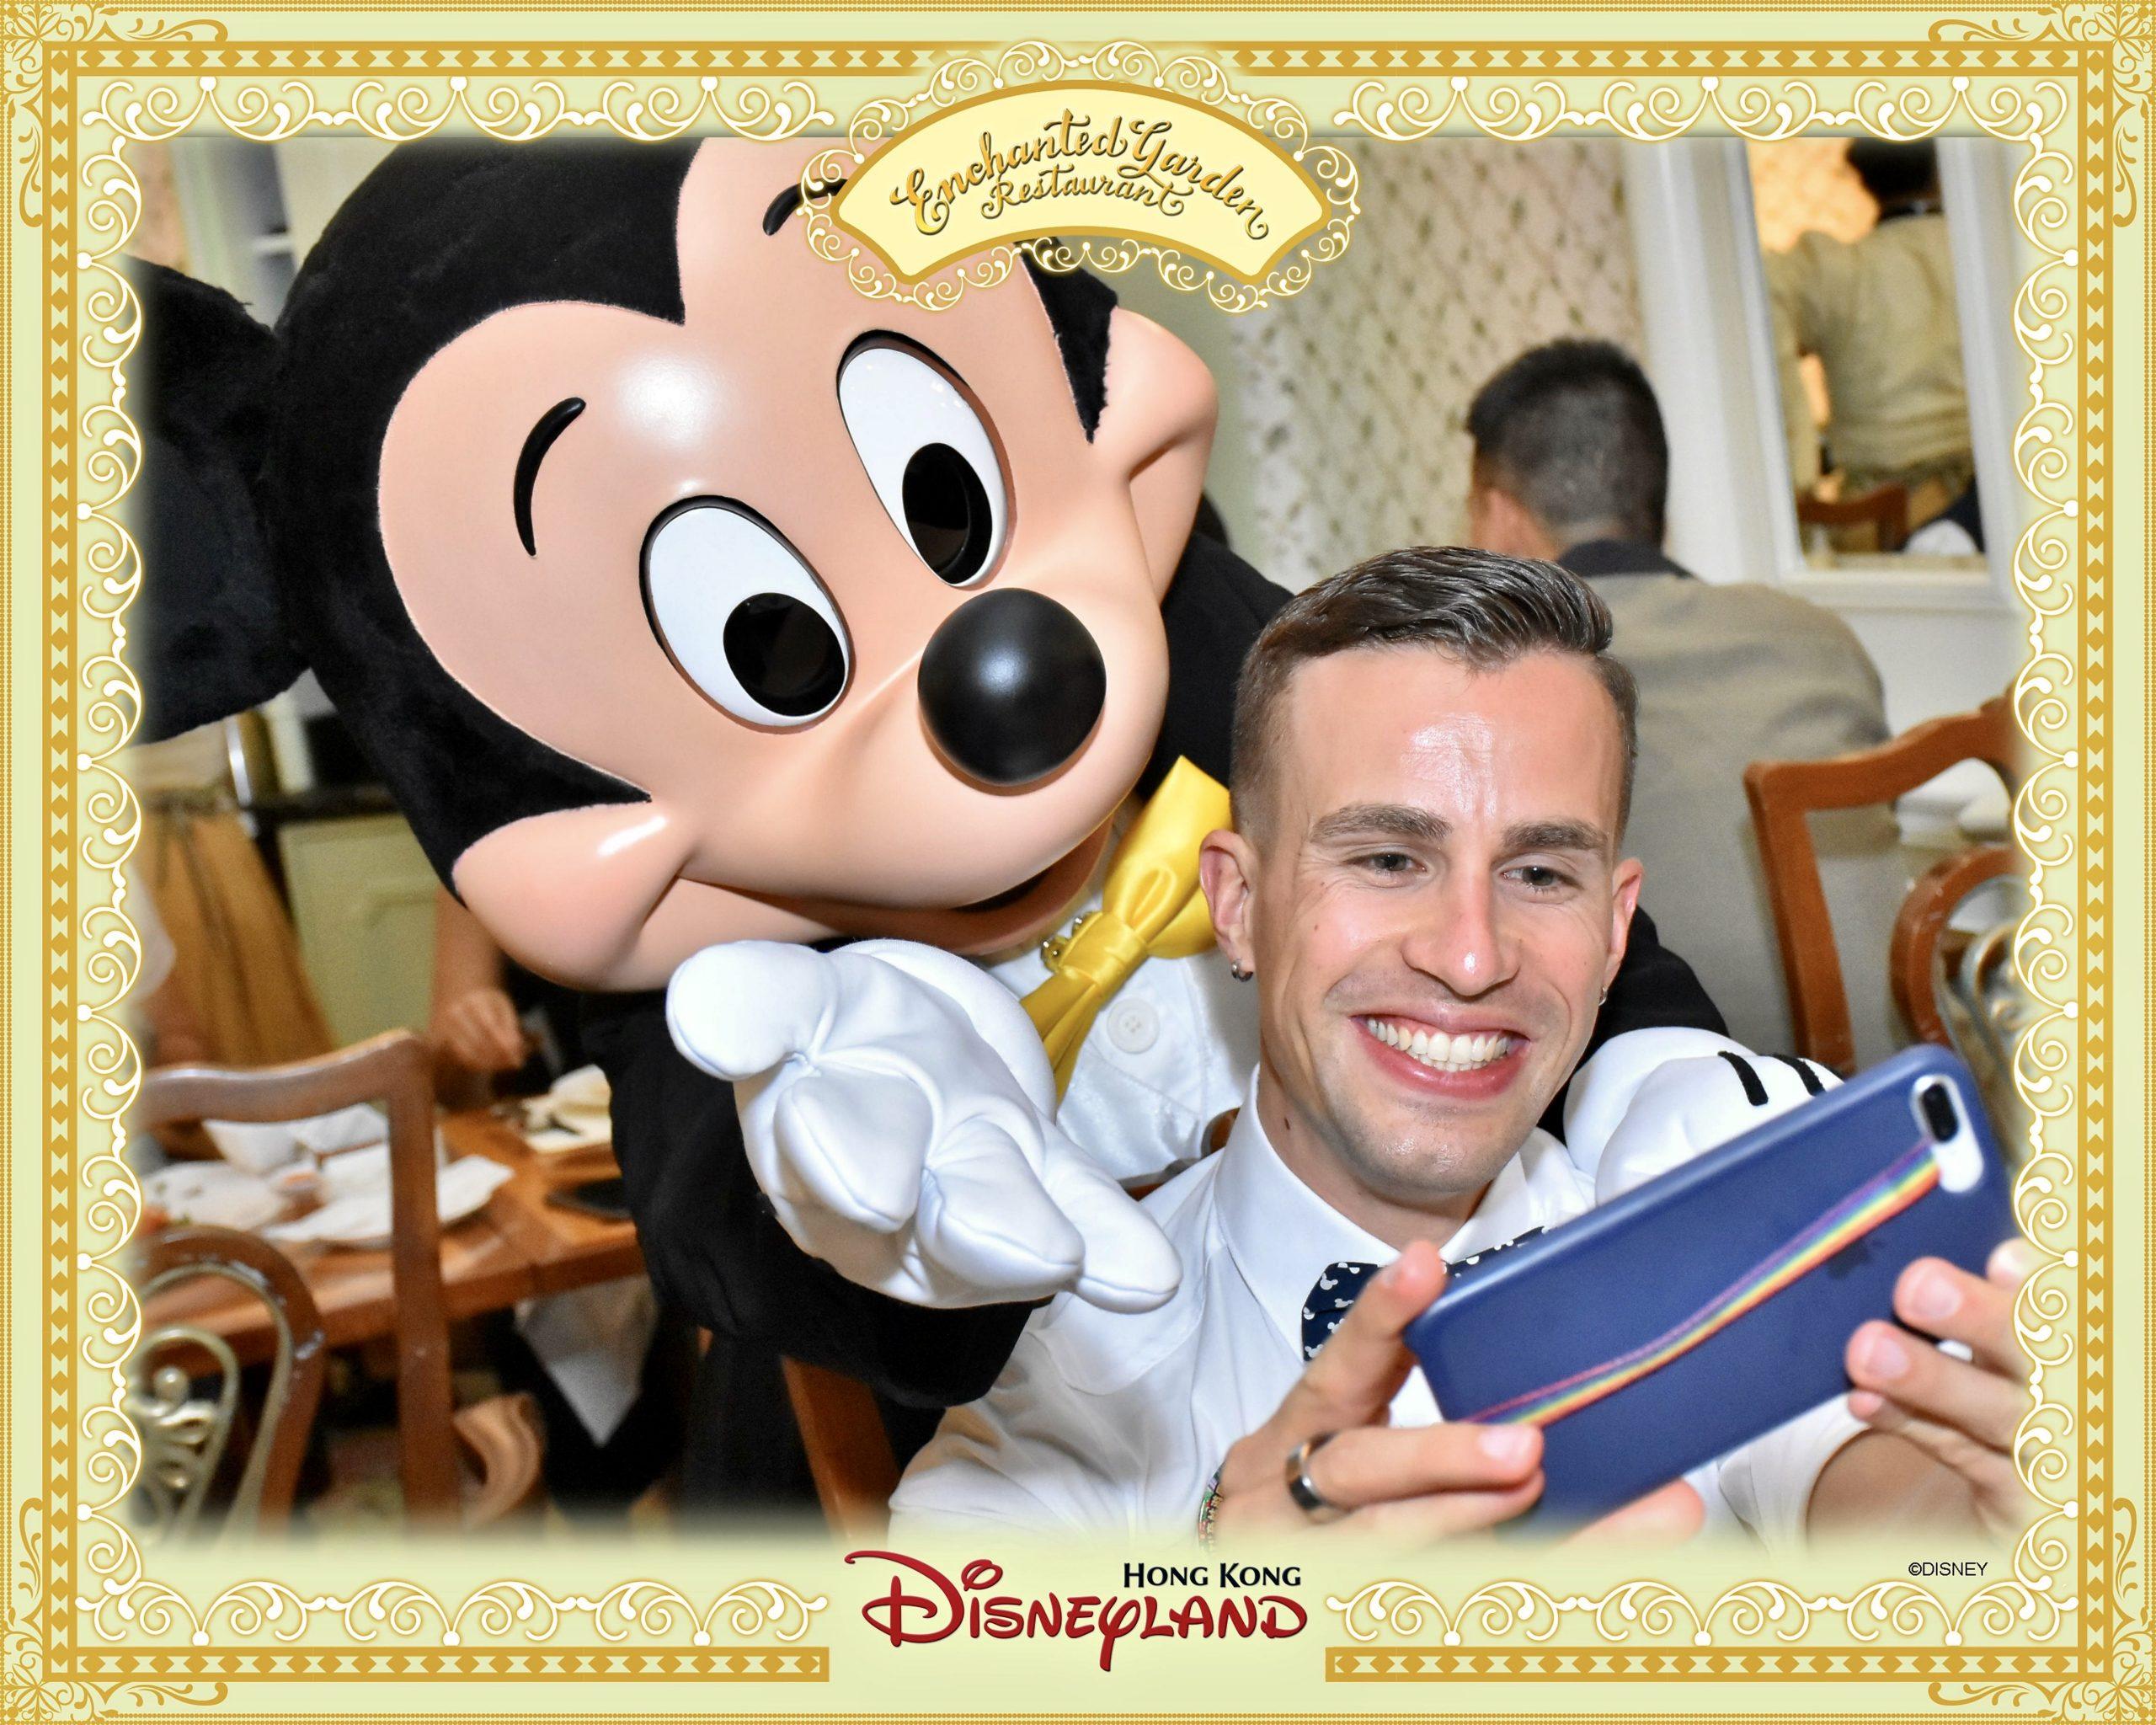 © Hong Kong Disneyland (PhotoPass)